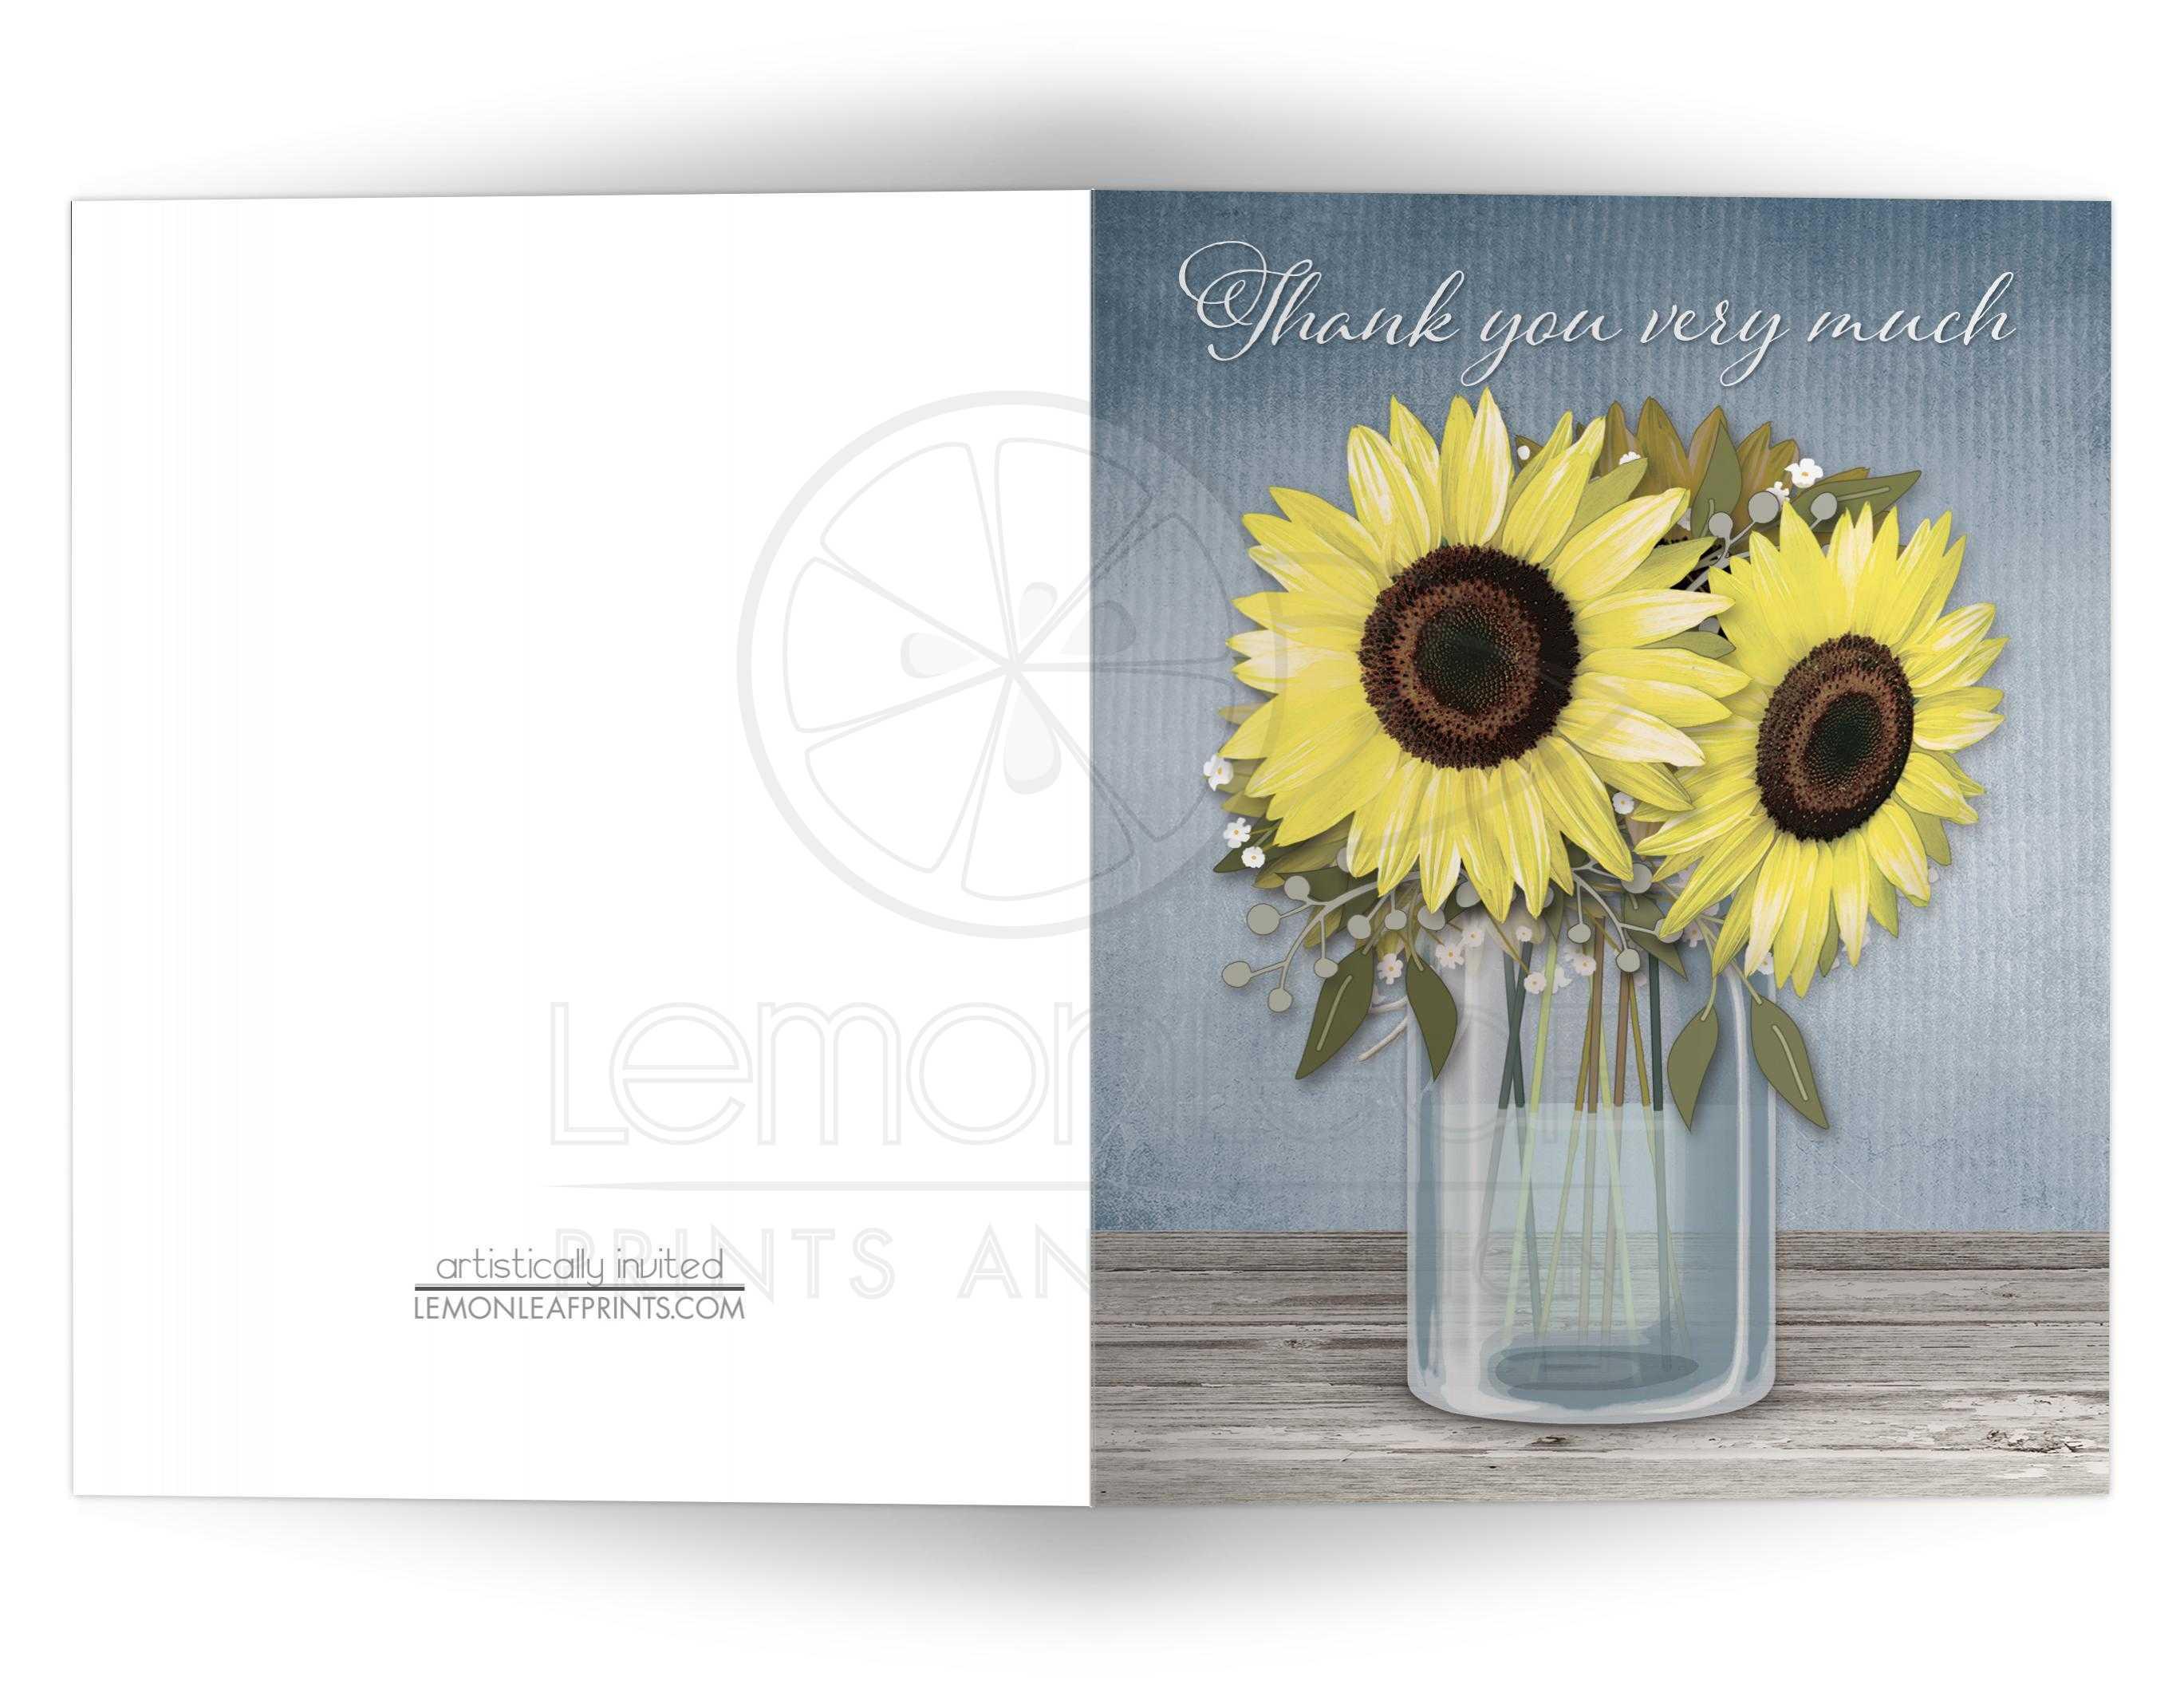 Thank You Cards - Rustic Sunflower Blue Mason Jar